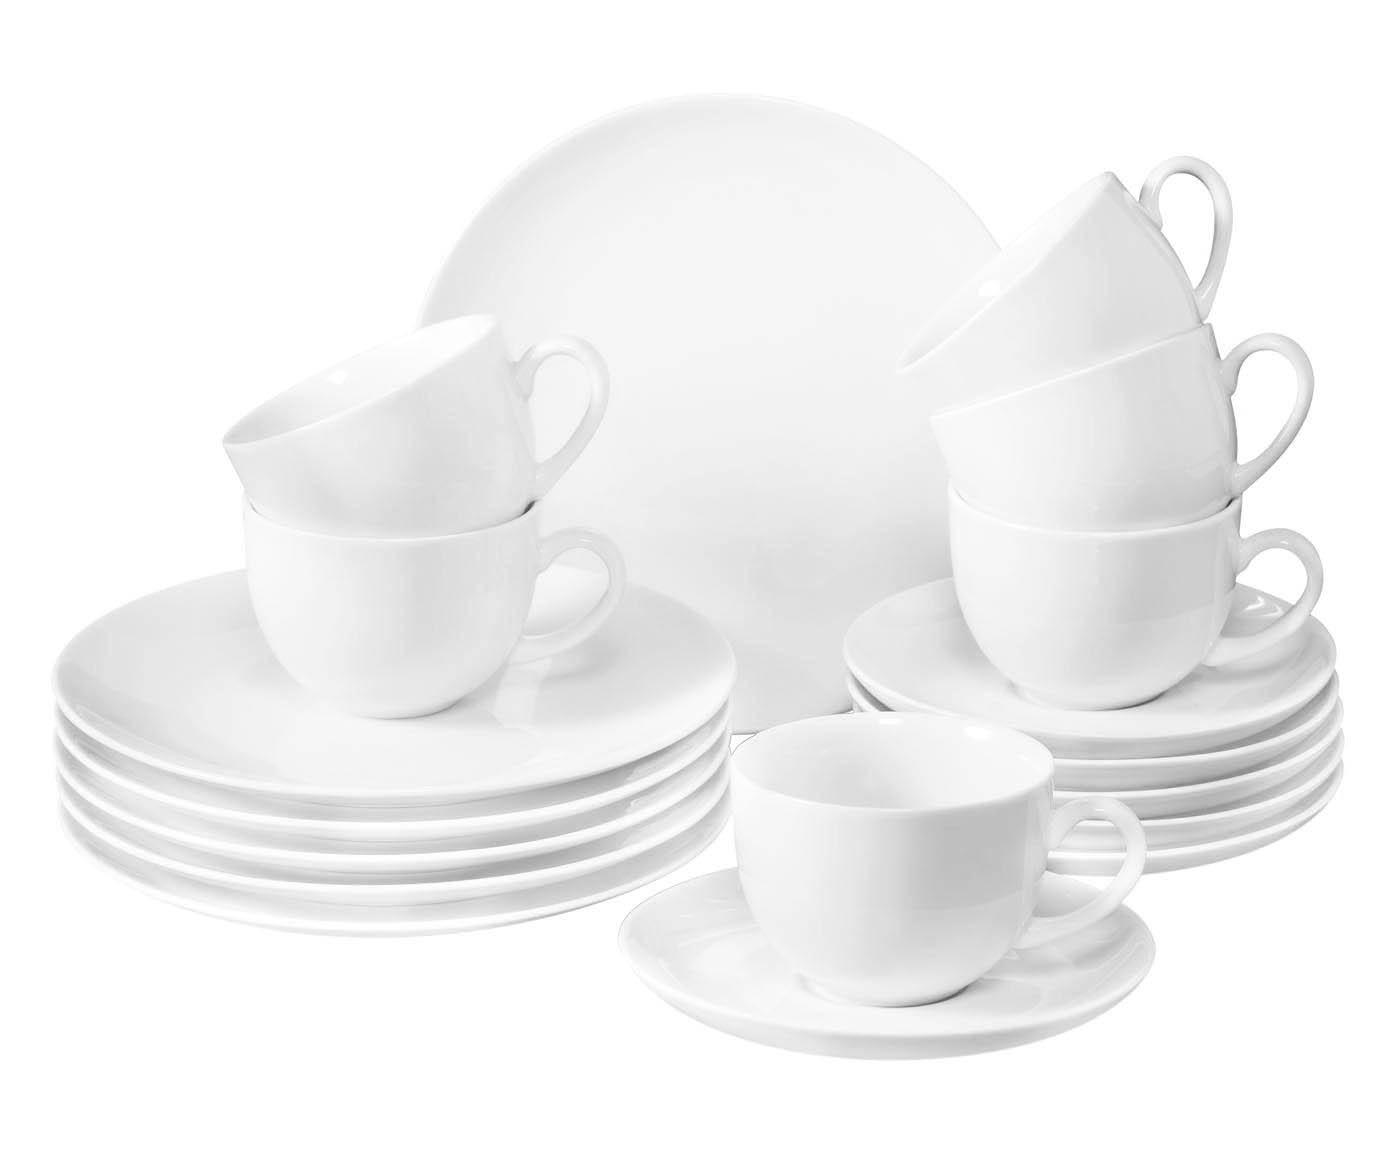 Servizio caffe'/dolce in porcellana New Fresh Basic, 18 pz